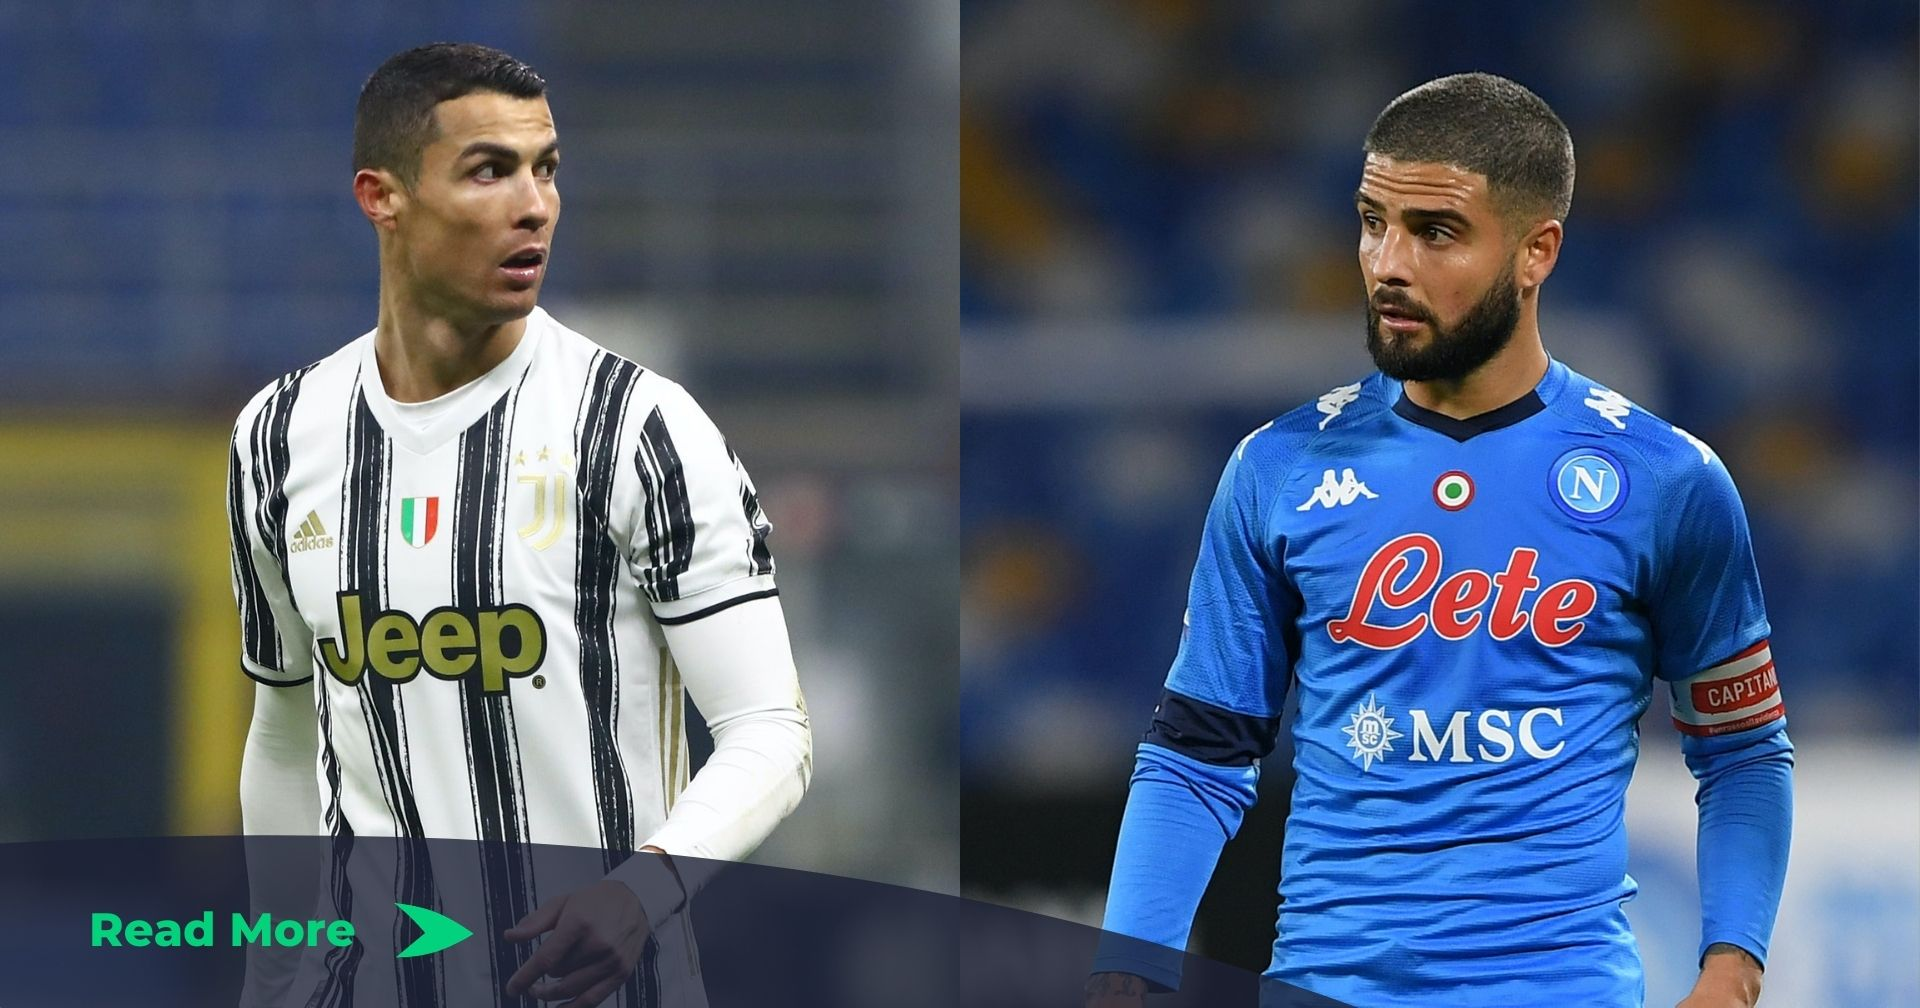 Juventus Vs Napoli Final De La Supercopa De Italia